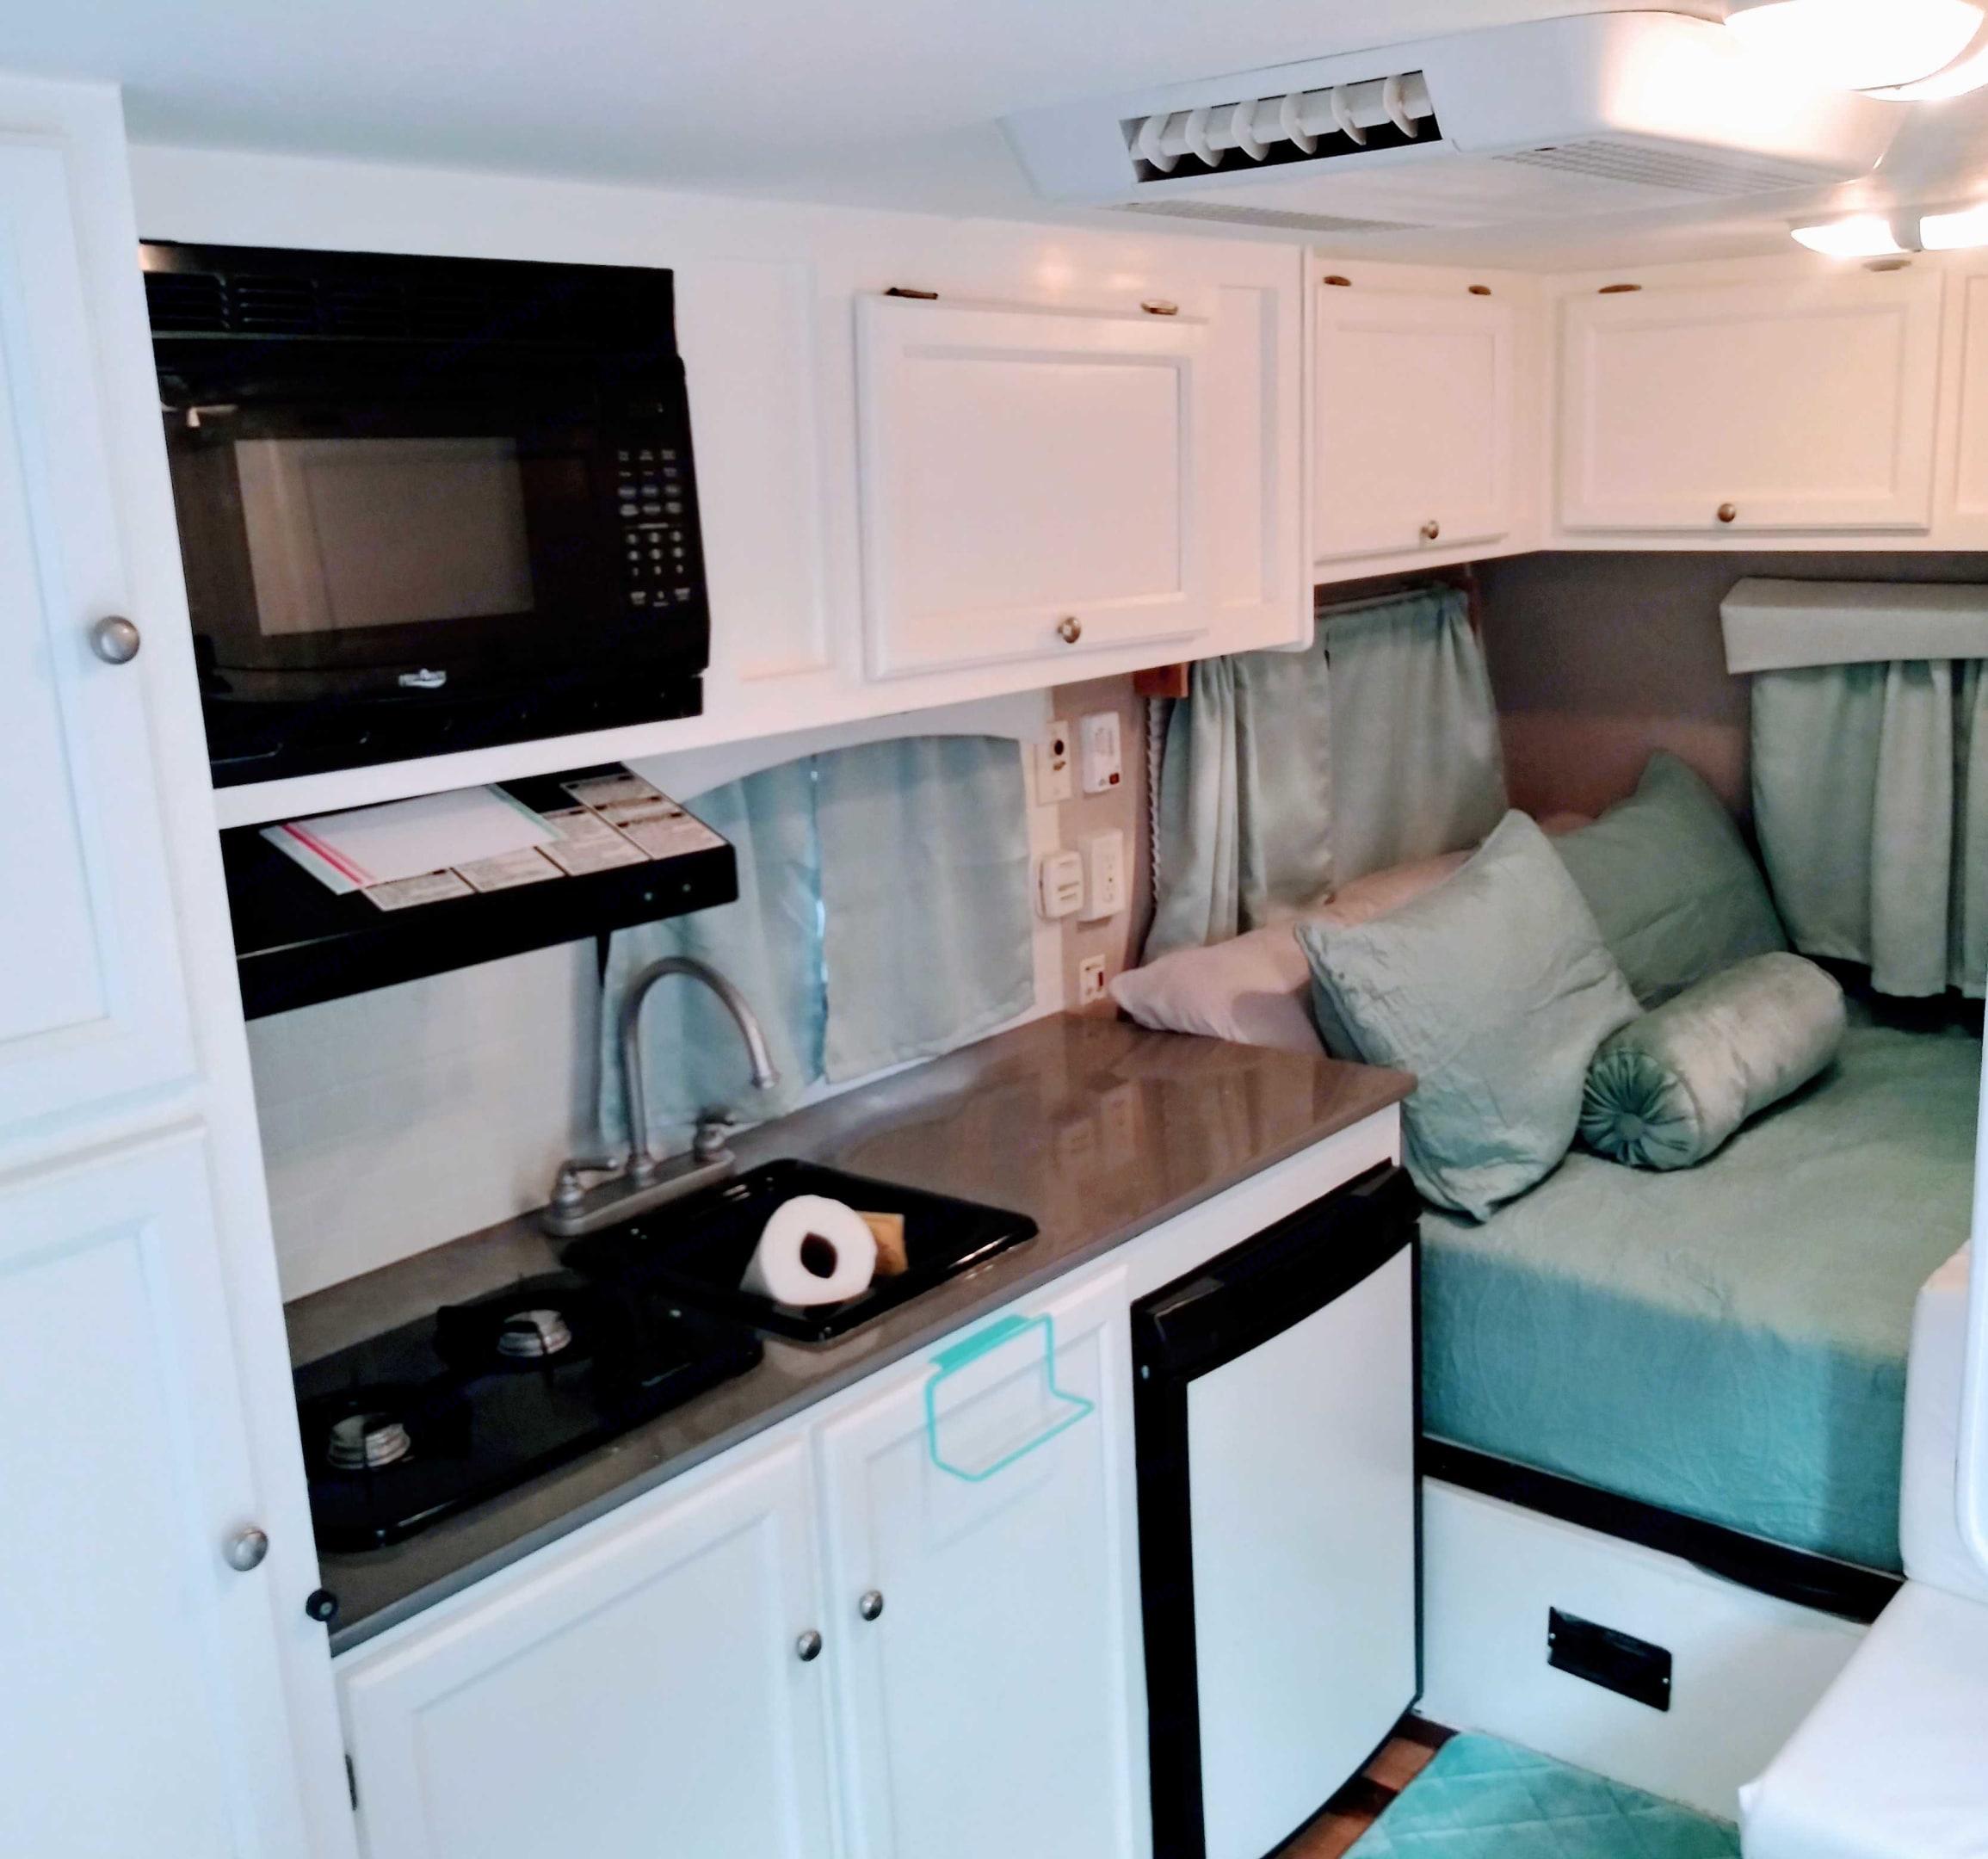 Kitchen area.  2 burner stove, Refridgerator/Freezer, Microwave.. Coachmen Clipper 2013